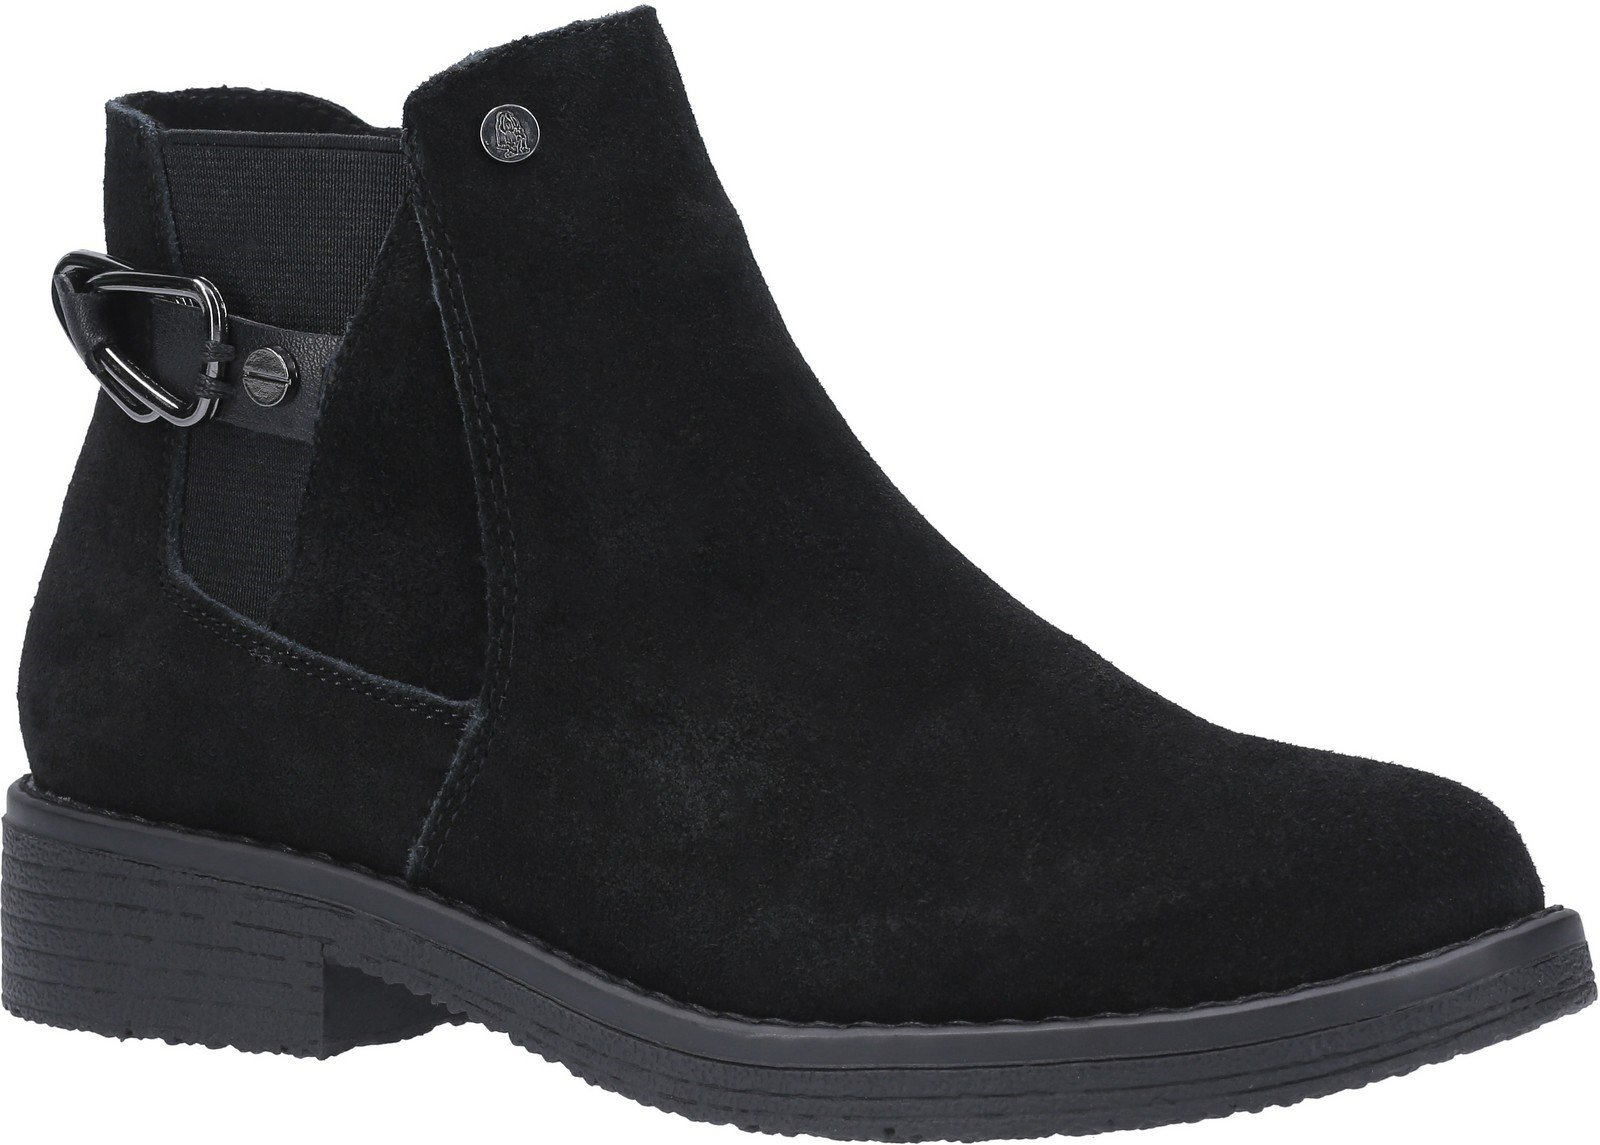 Hush Puppies Women's Alaska Flat Slip On Chelsea Boot Various Colours 27345 - Black 9